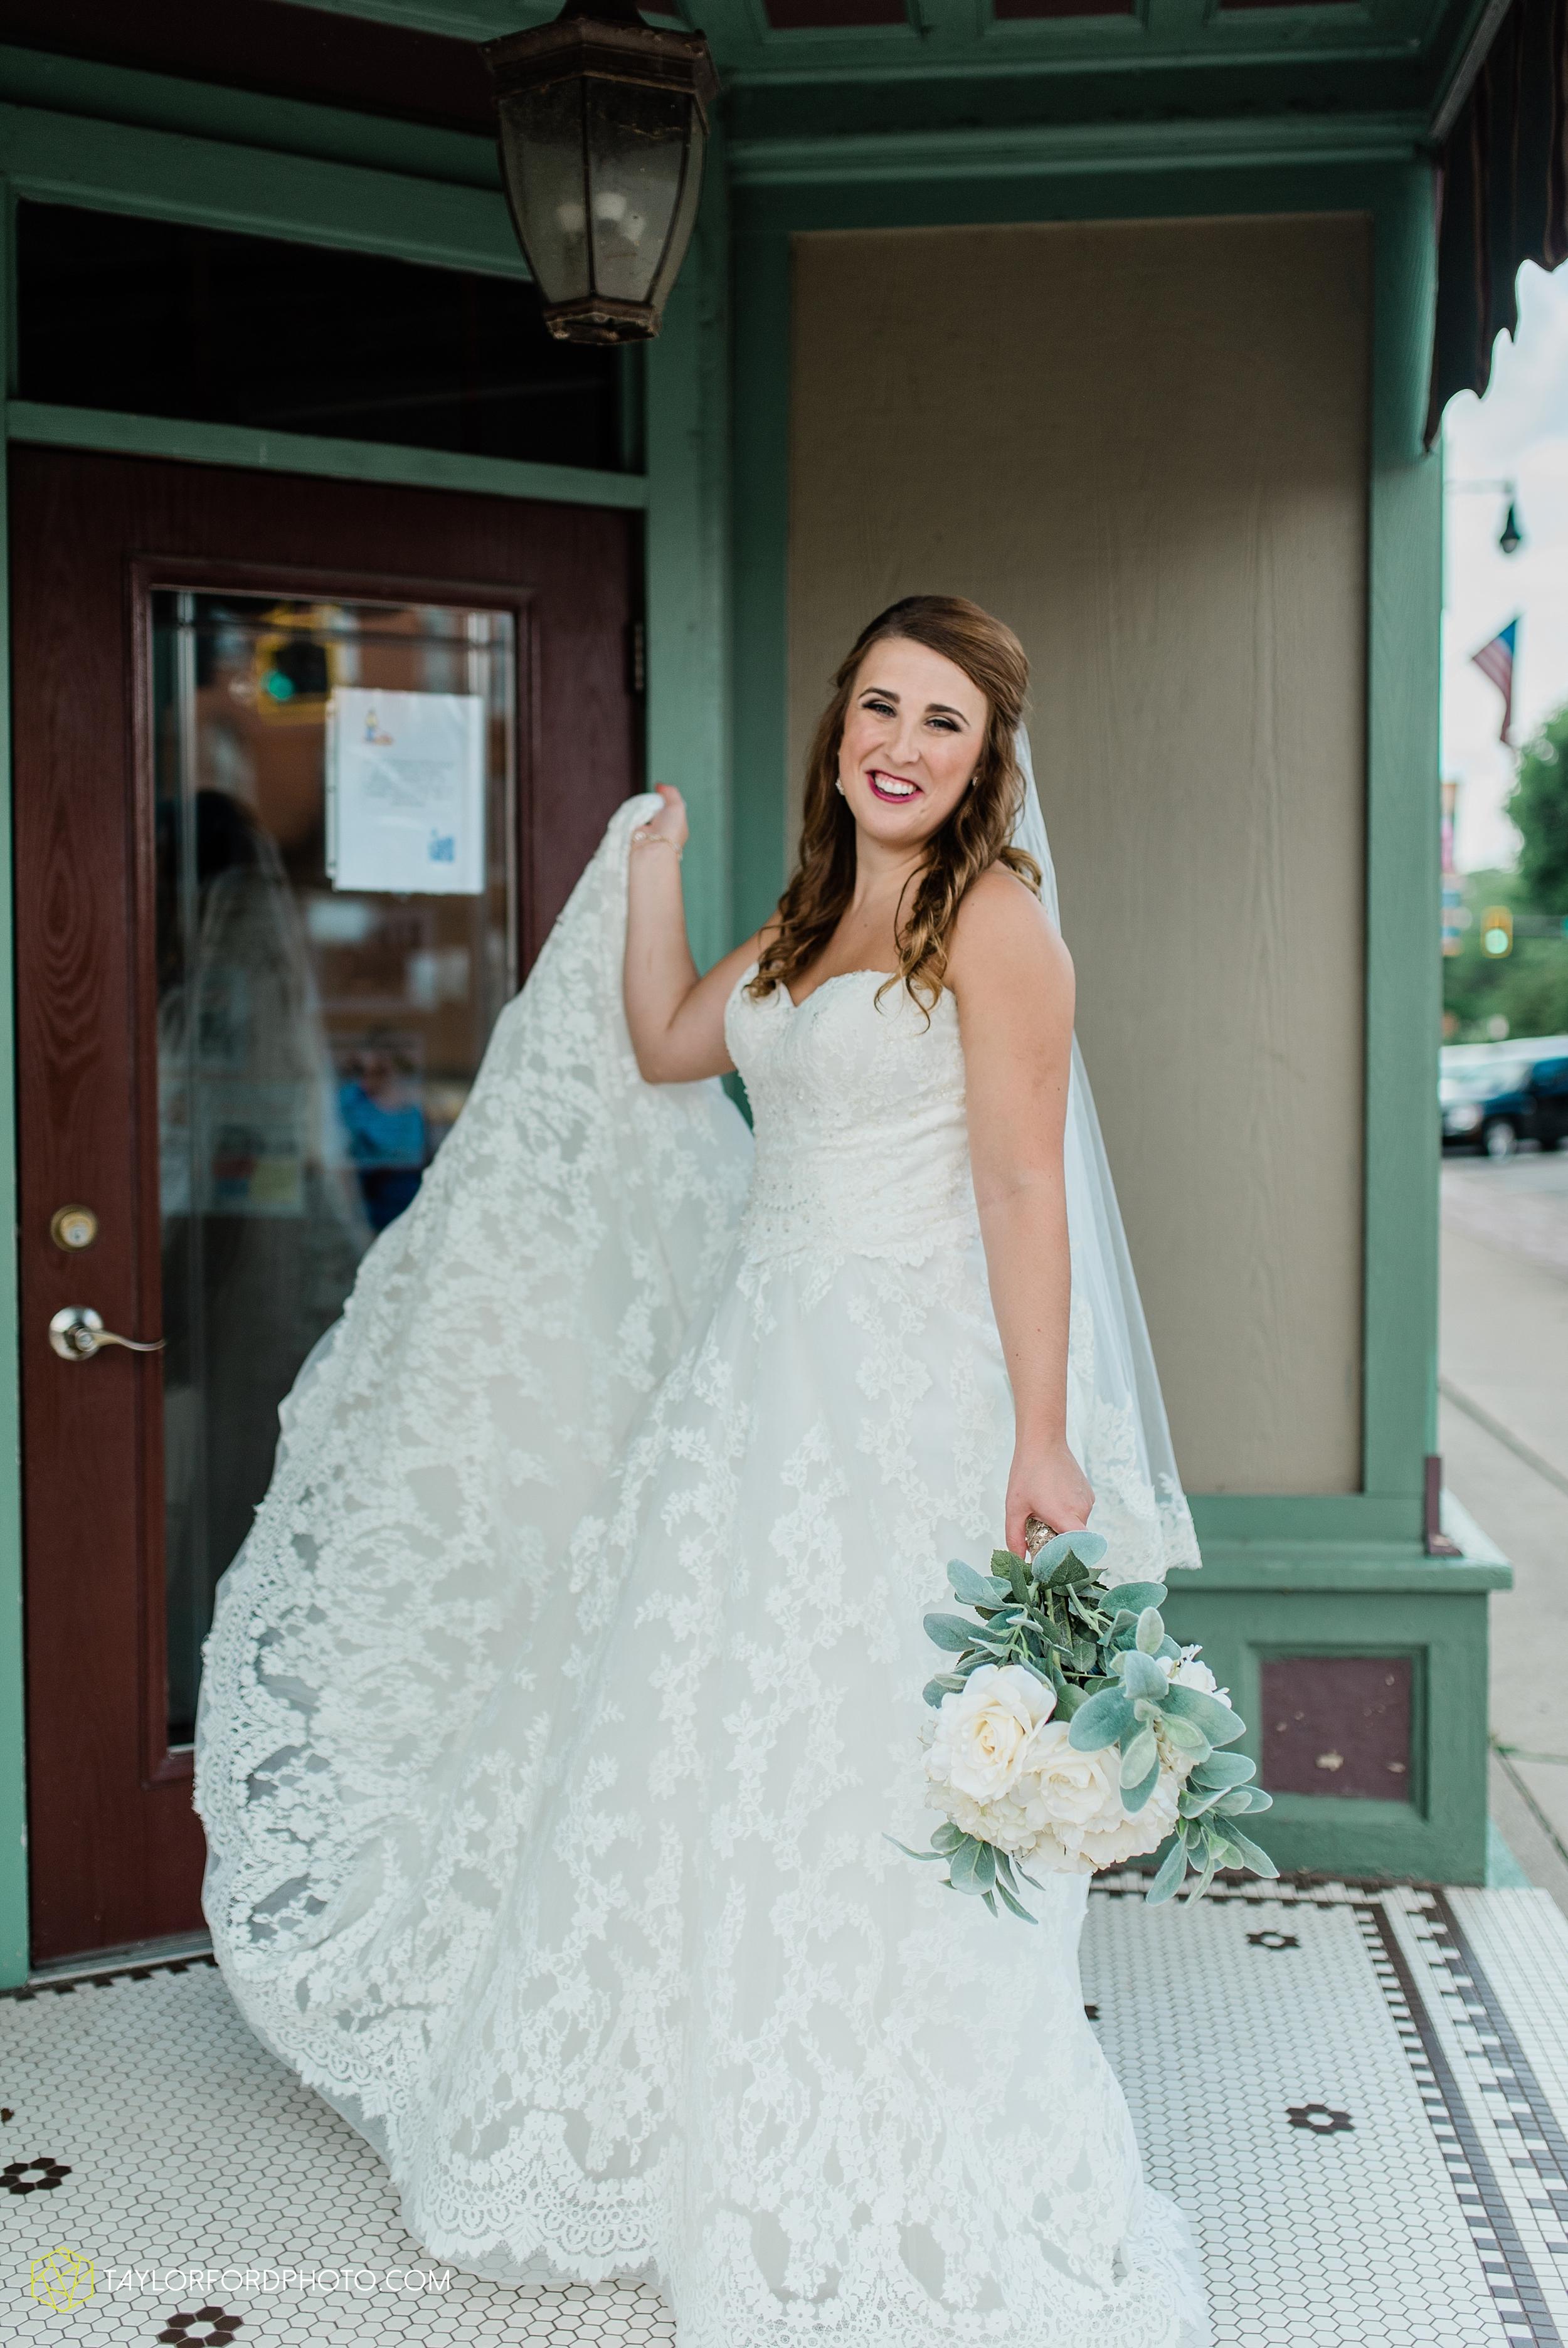 chelsey-zosh-jackson-young-first-united-methodist-church-senior-center-van-wert-ohio-wedding-photographer-taylor-ford-photography_0059.jpg